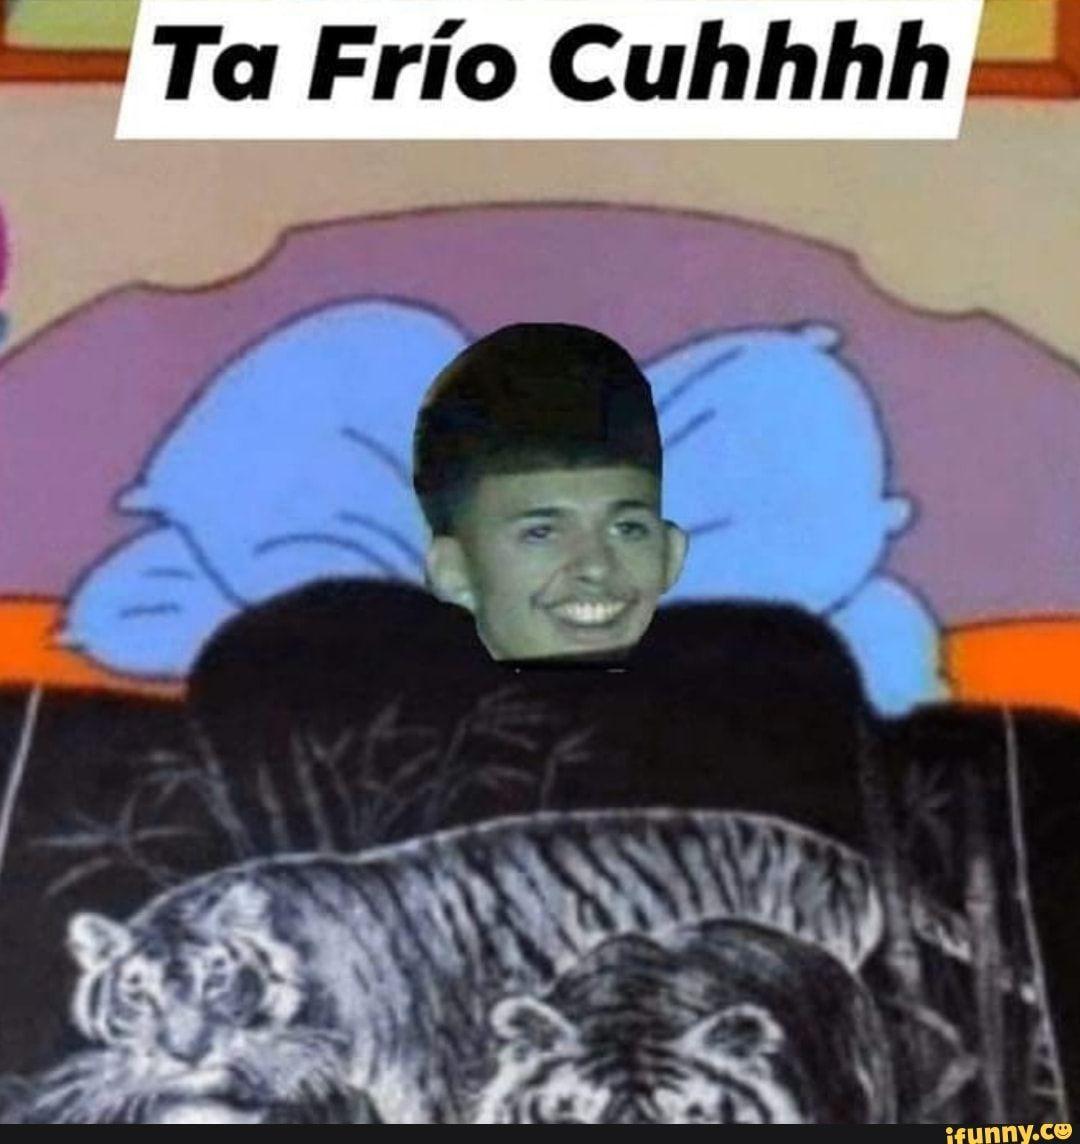 Ta Frio Cuhhhh A Ifunny Mexican Funny Memes Mexican Jokes Mexican Jokes Humor